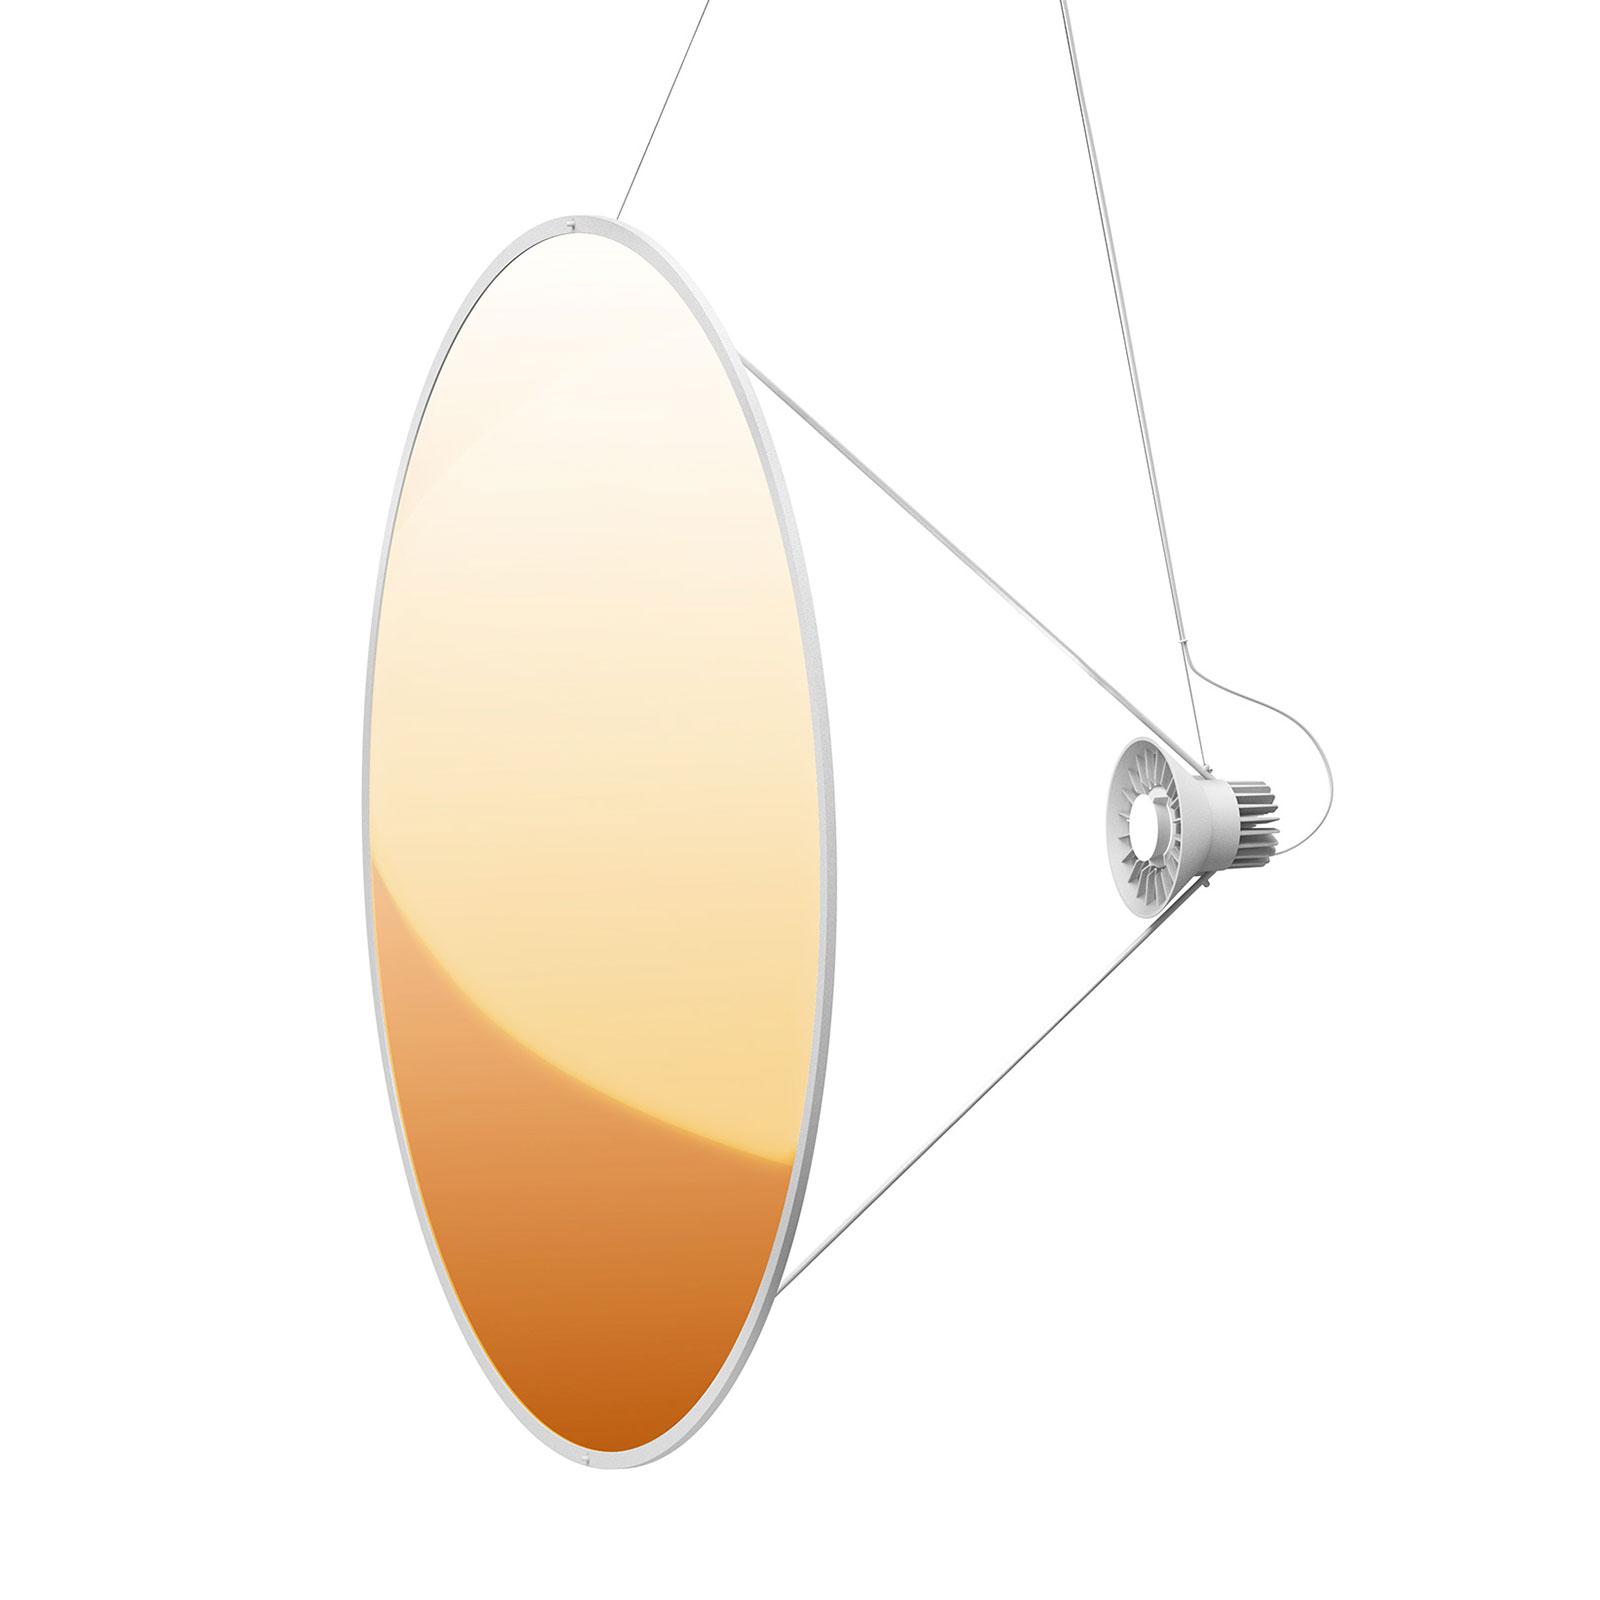 Luceplan Amisol LED hanglamp Ø 110cm goud